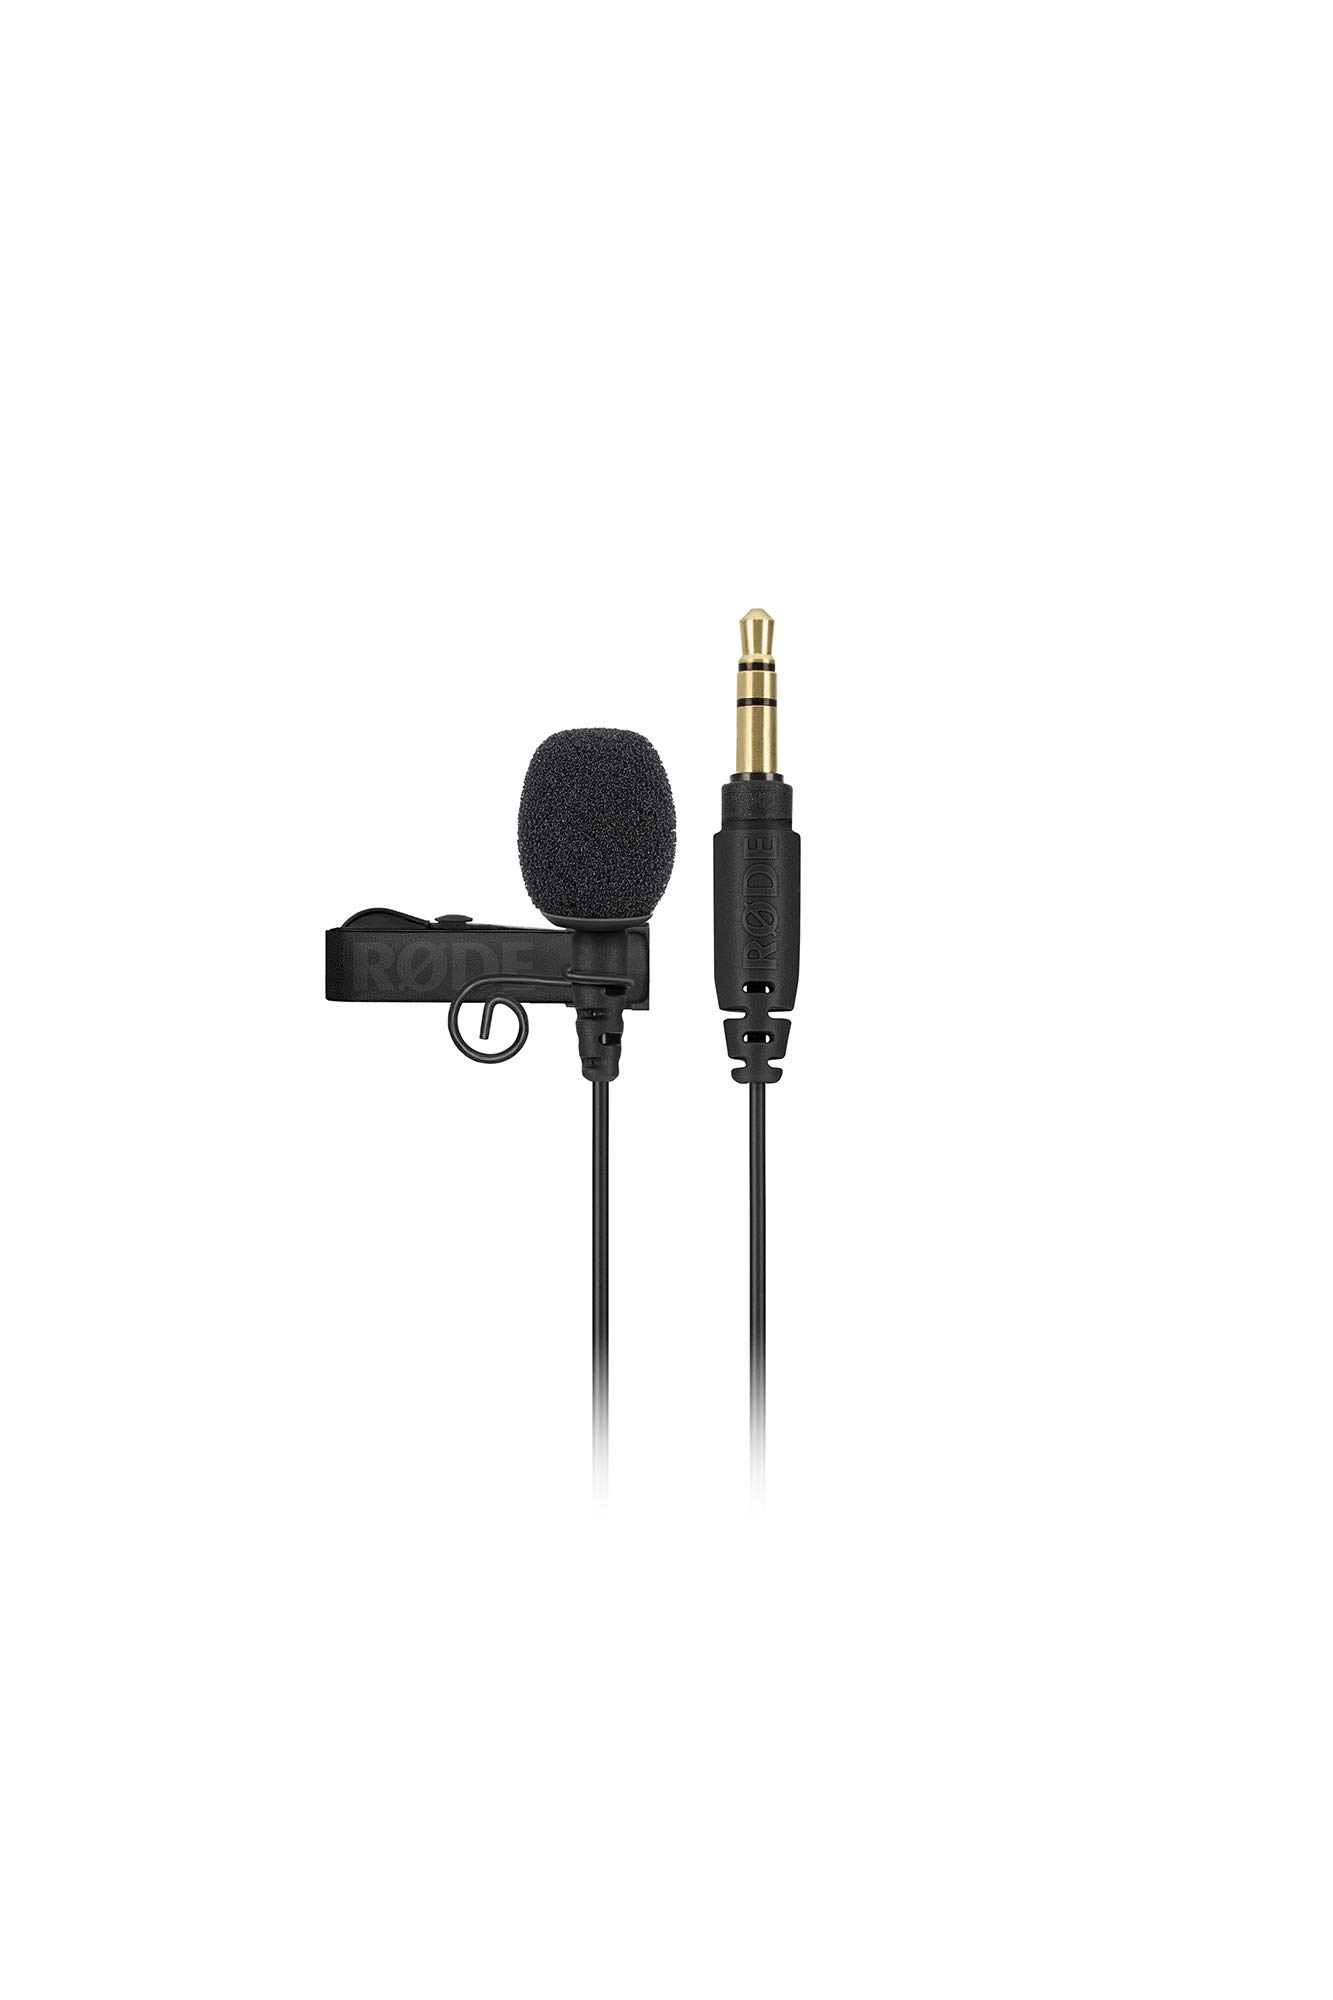 Rode Lavalier Go Microfono Portatil Profesional Para Cone...